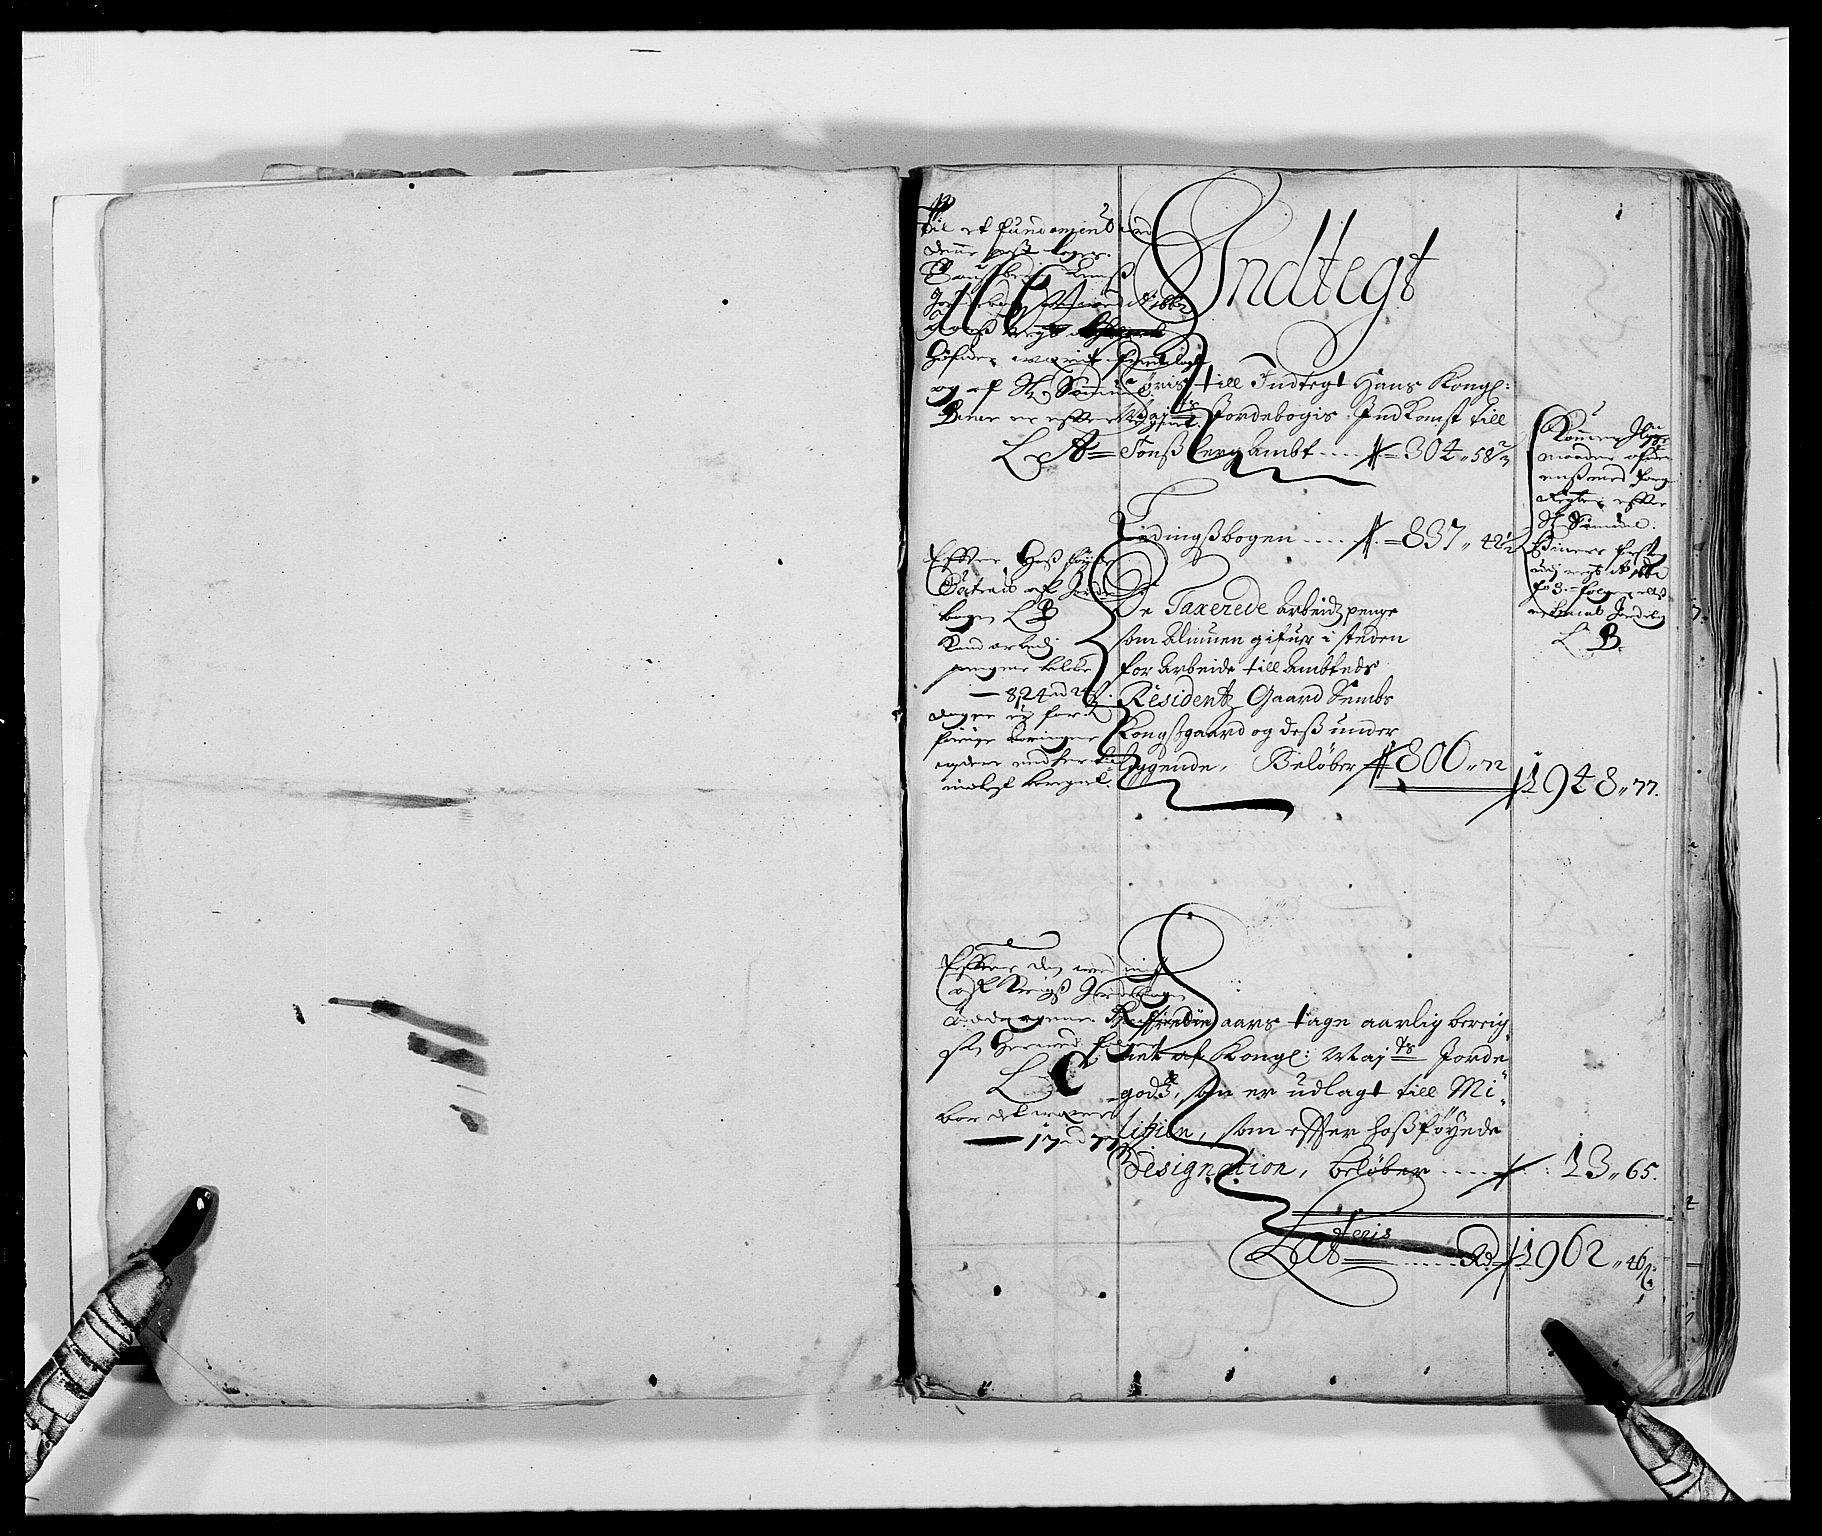 RA, Rentekammeret inntil 1814, Reviderte regnskaper, Fogderegnskap, R32/L1839: Fogderegnskap Jarlsberg grevskap, 1664-1673, s. 7